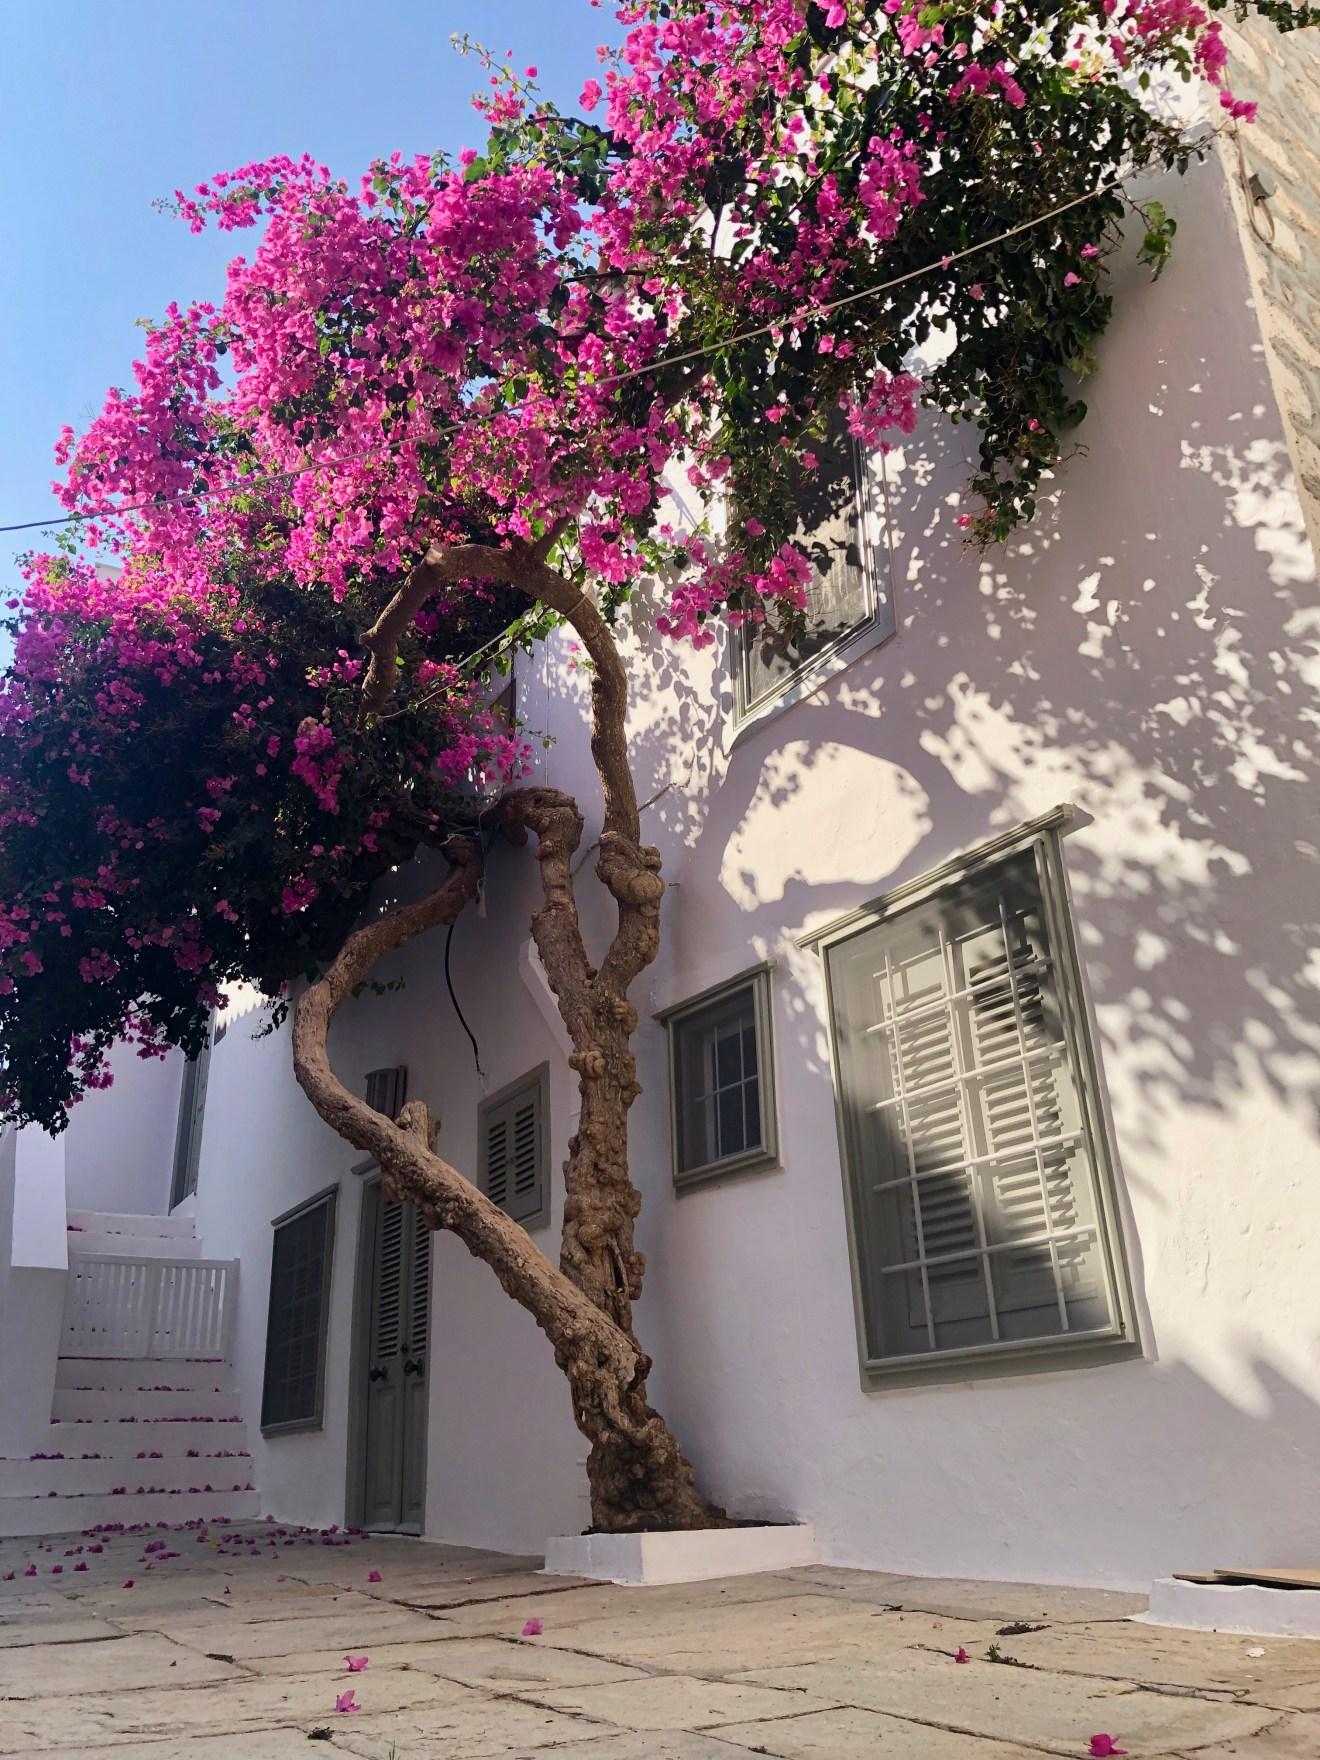 Hydra Tipps Griechenland Pflanze